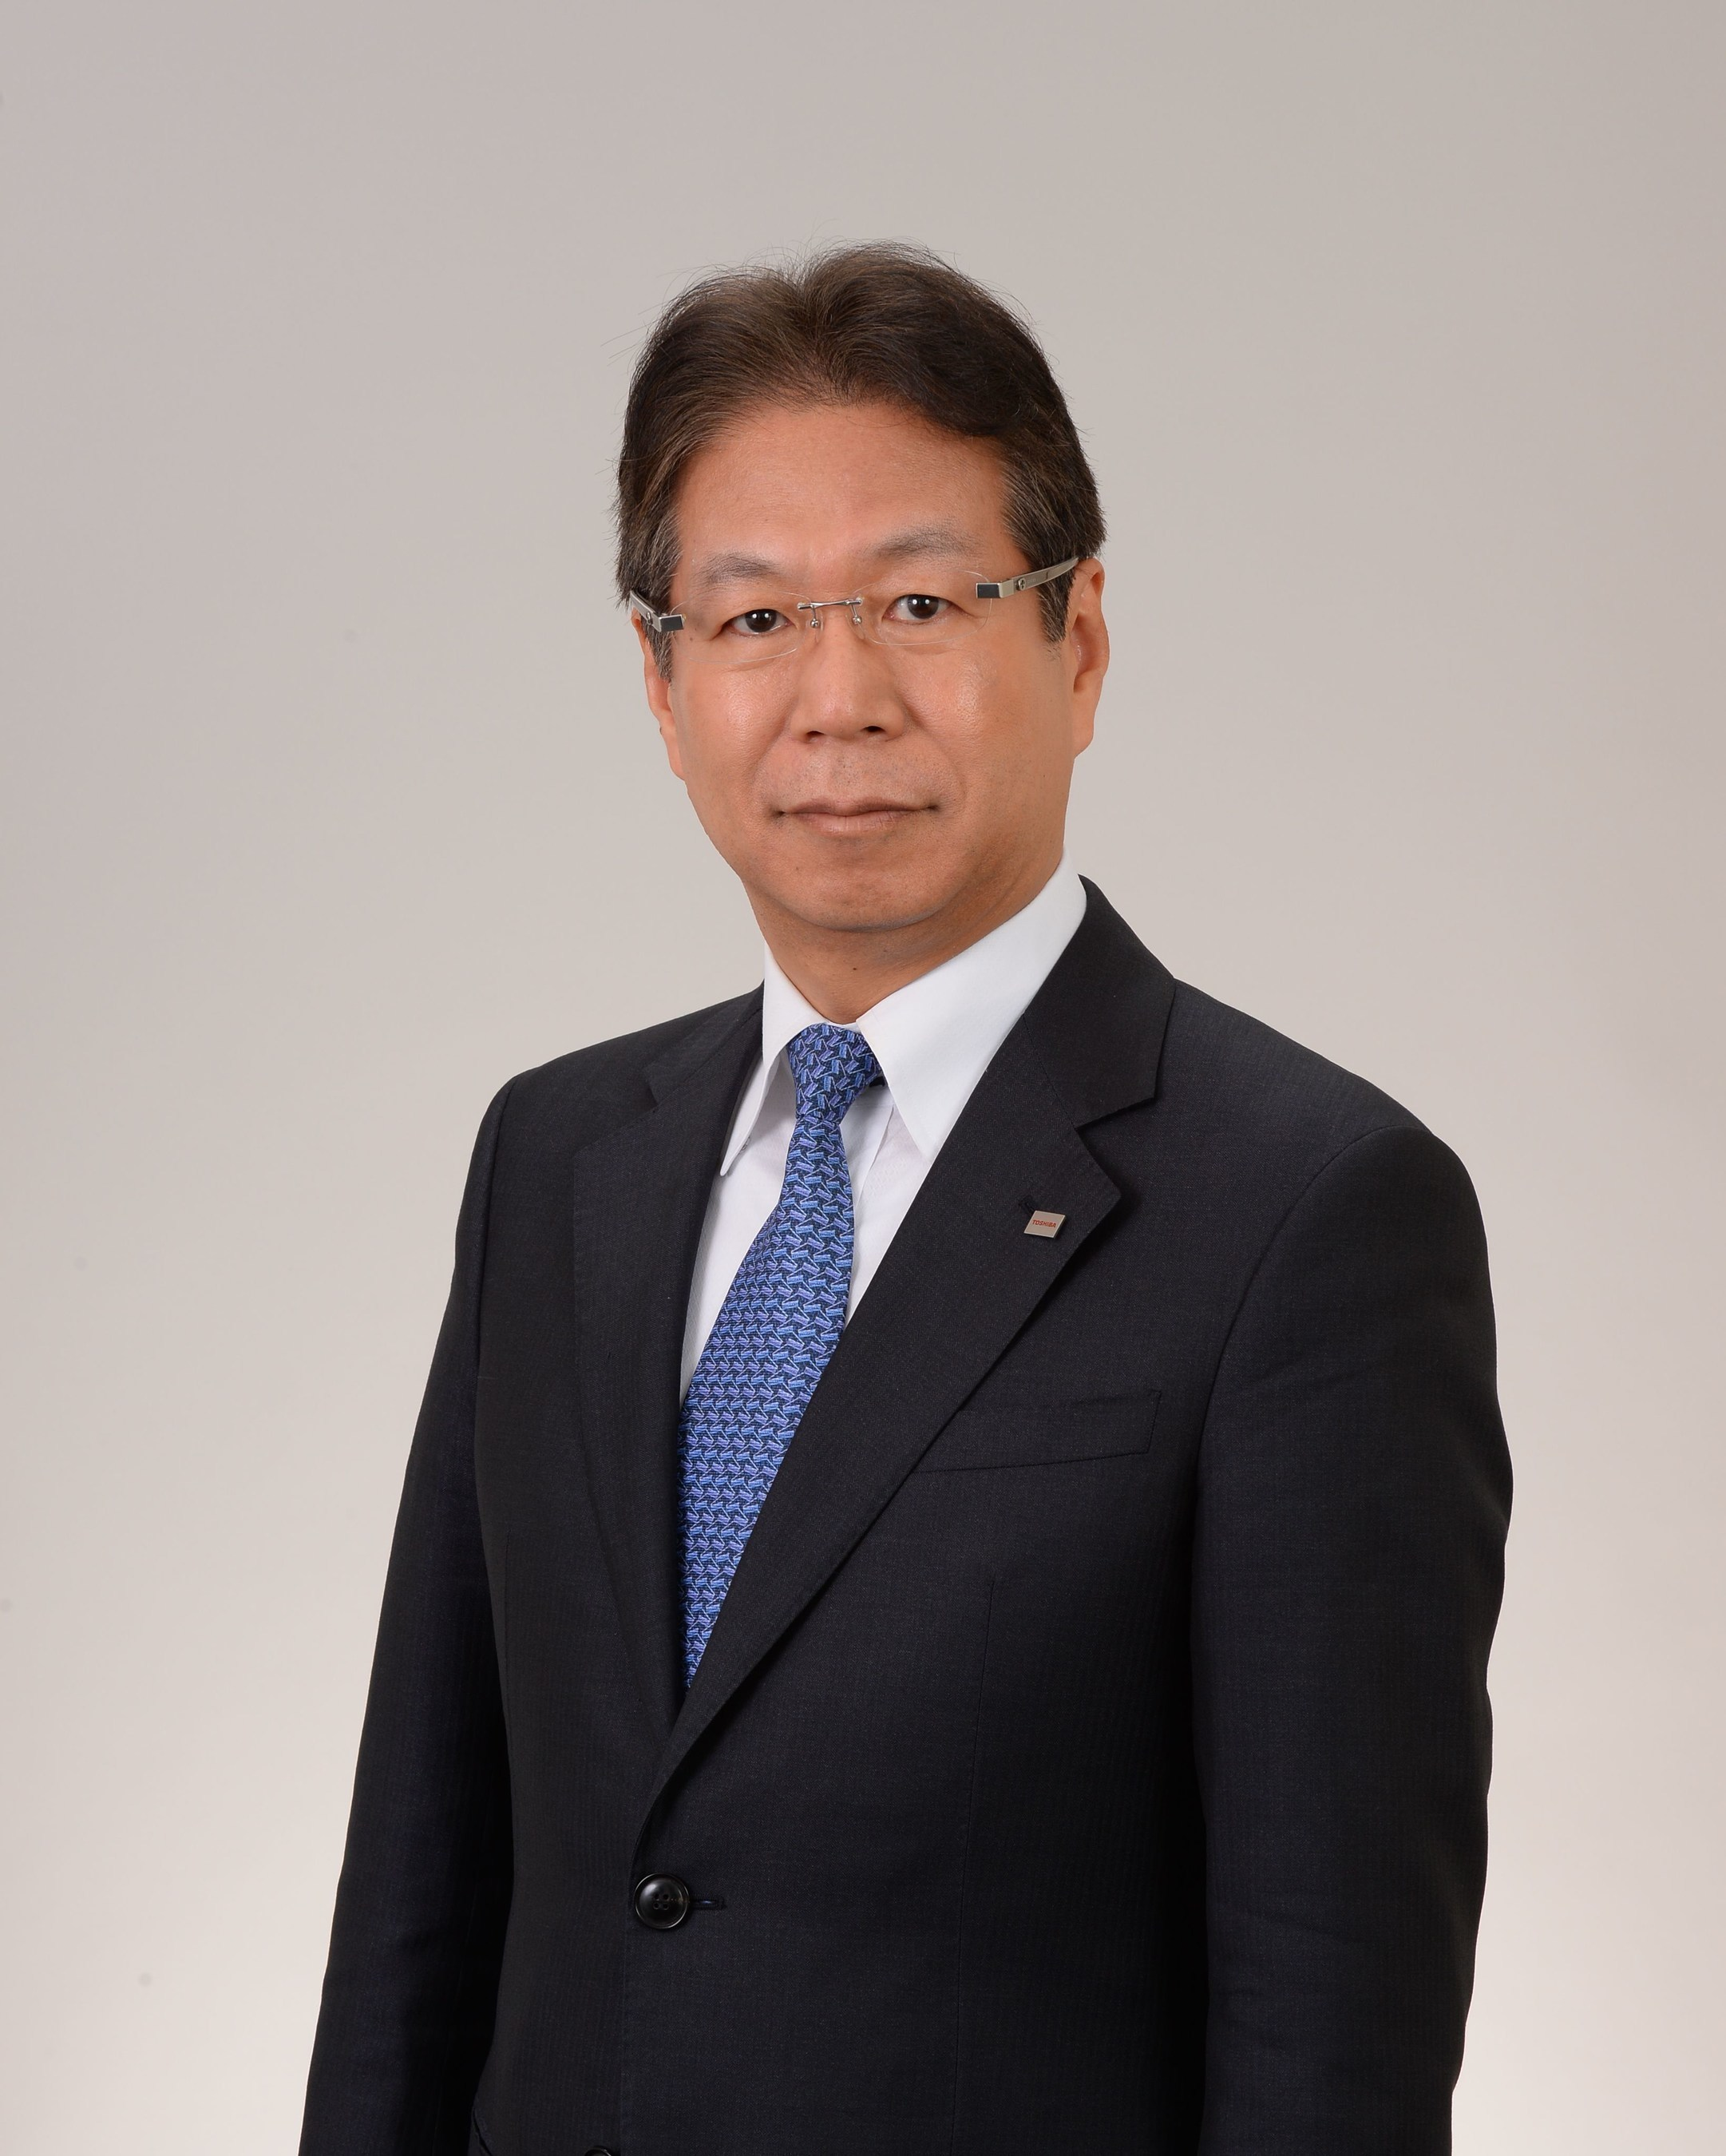 NuGen announces new Chairman (PRNewsFoto/NuGen)